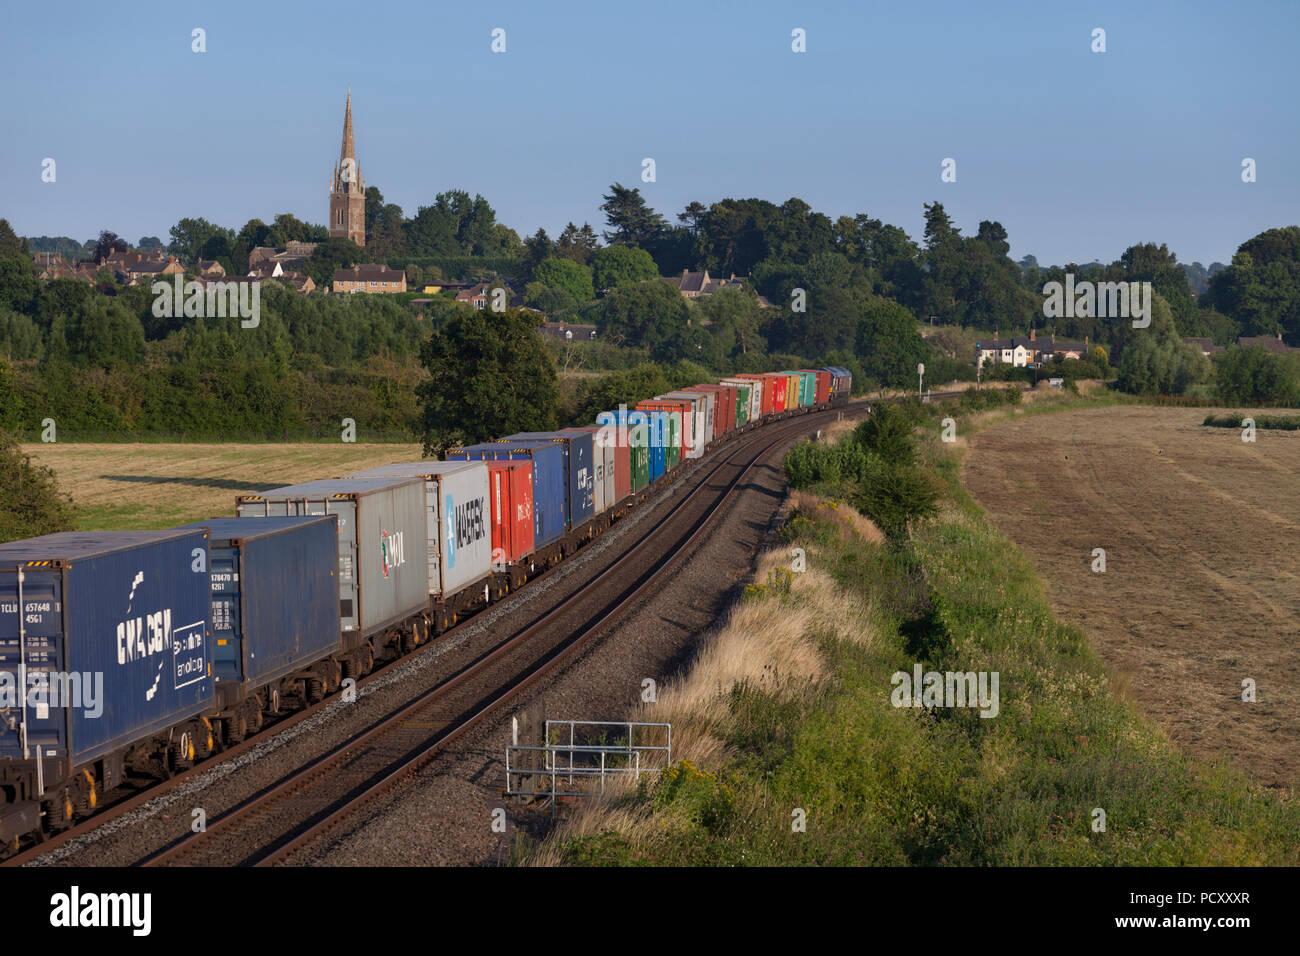 Harbor Freight Gantry Crane >> Intermodal Stock Photos & Intermodal Stock Images - Alamy